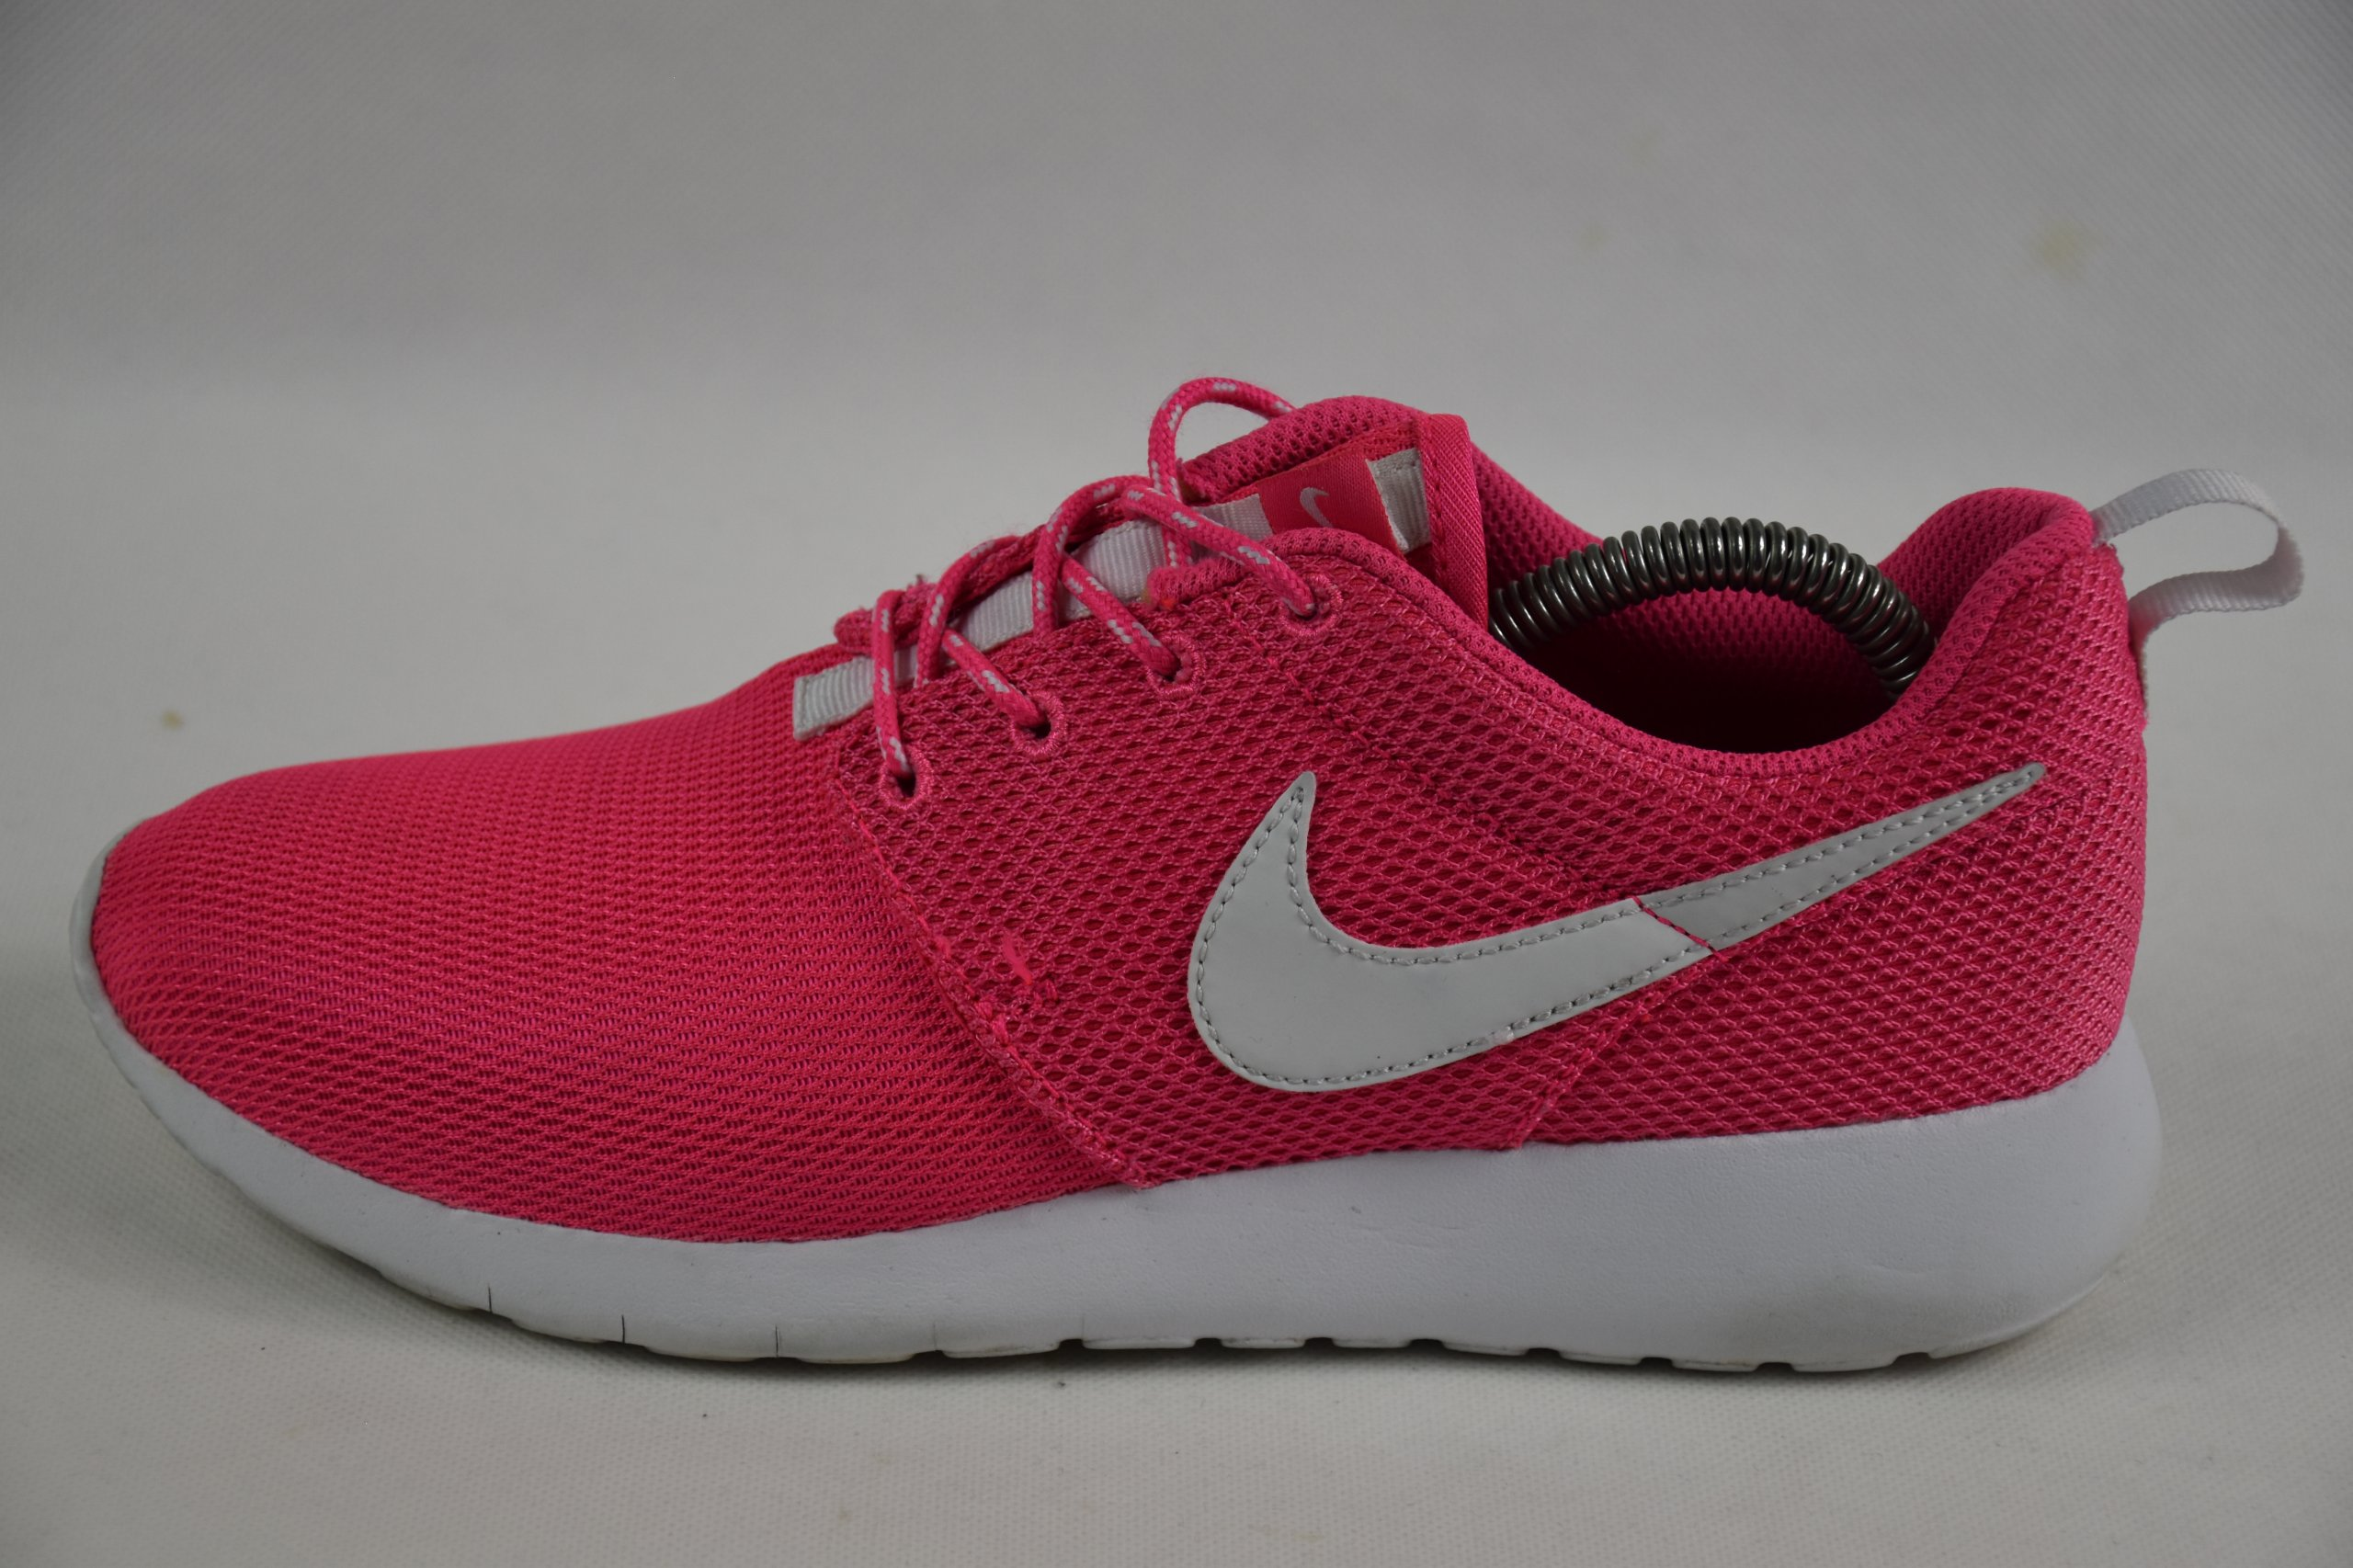 Nike Roshe Run adidasy sportowe r.38,524cm